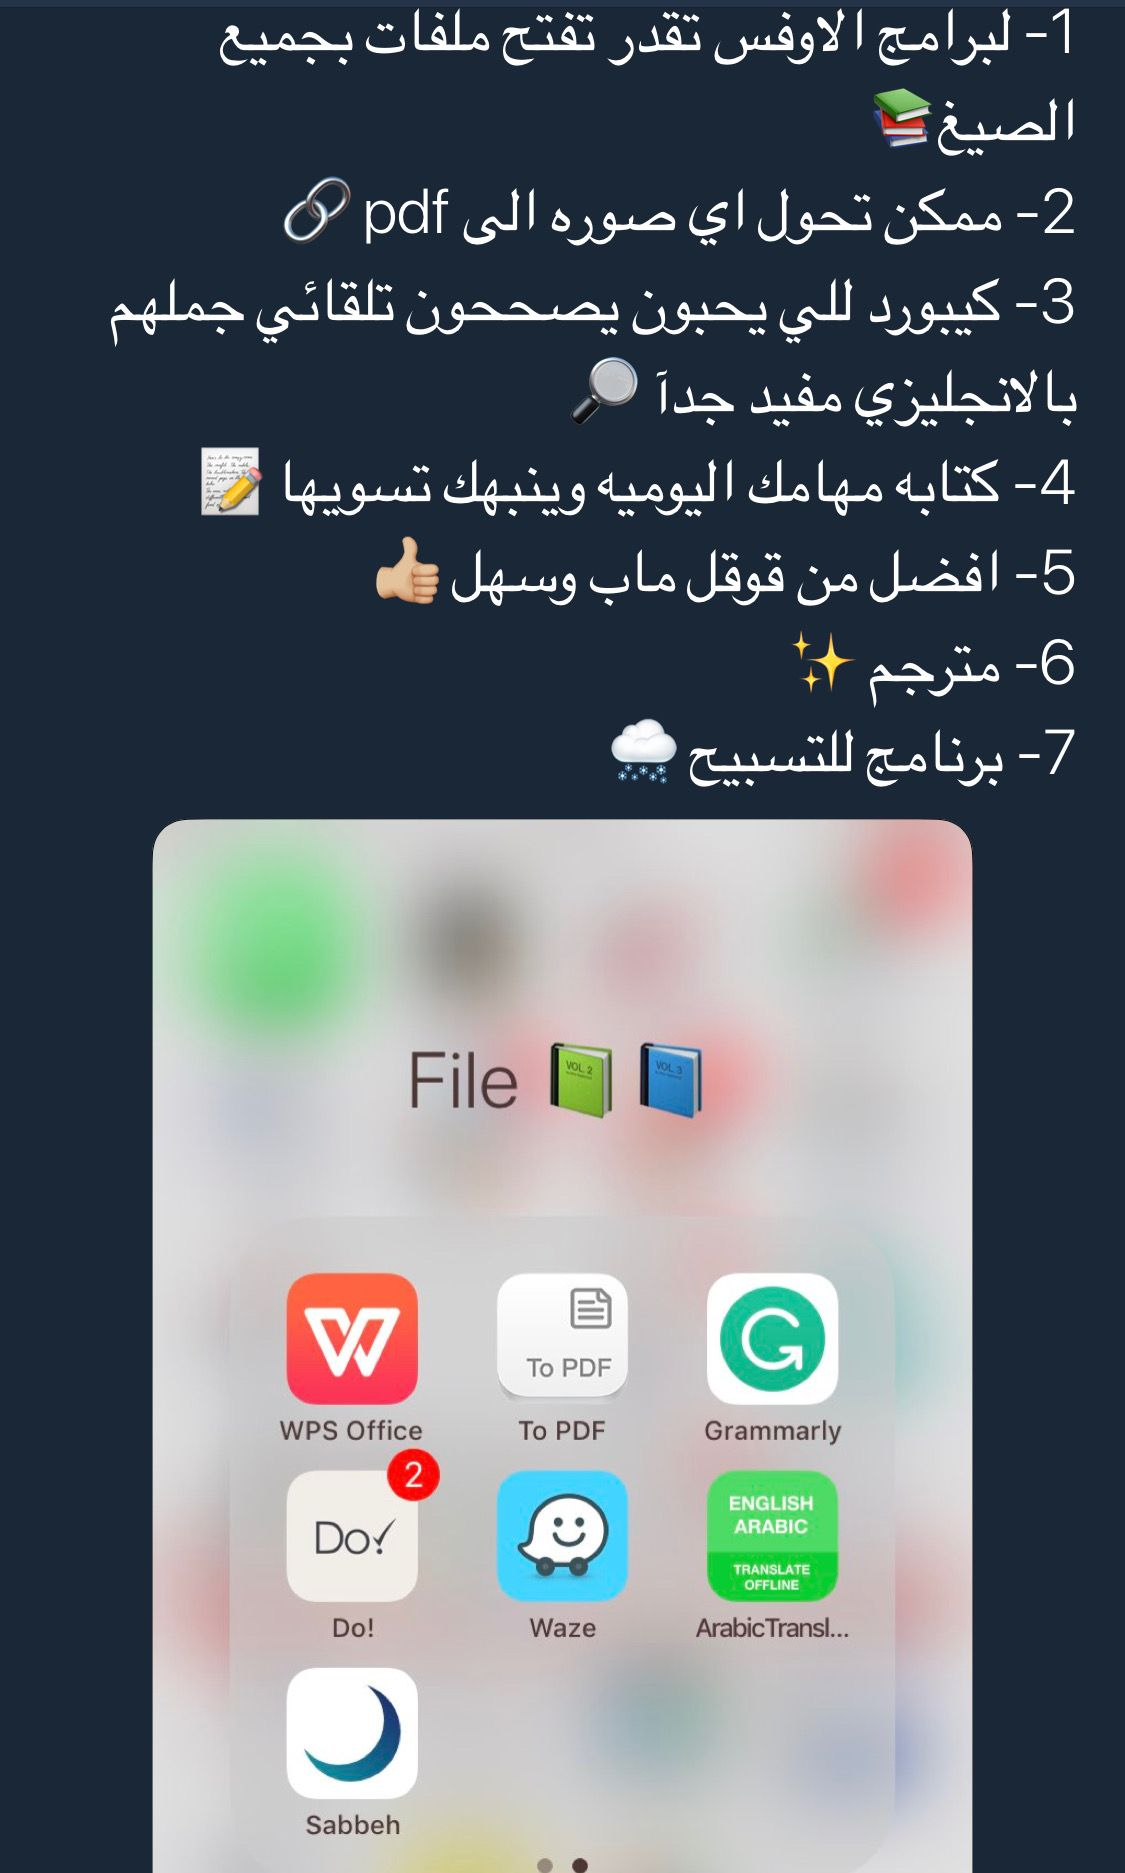 Pin By ريم كريم On ا Application Iphone Phone Application Iphone App Layout